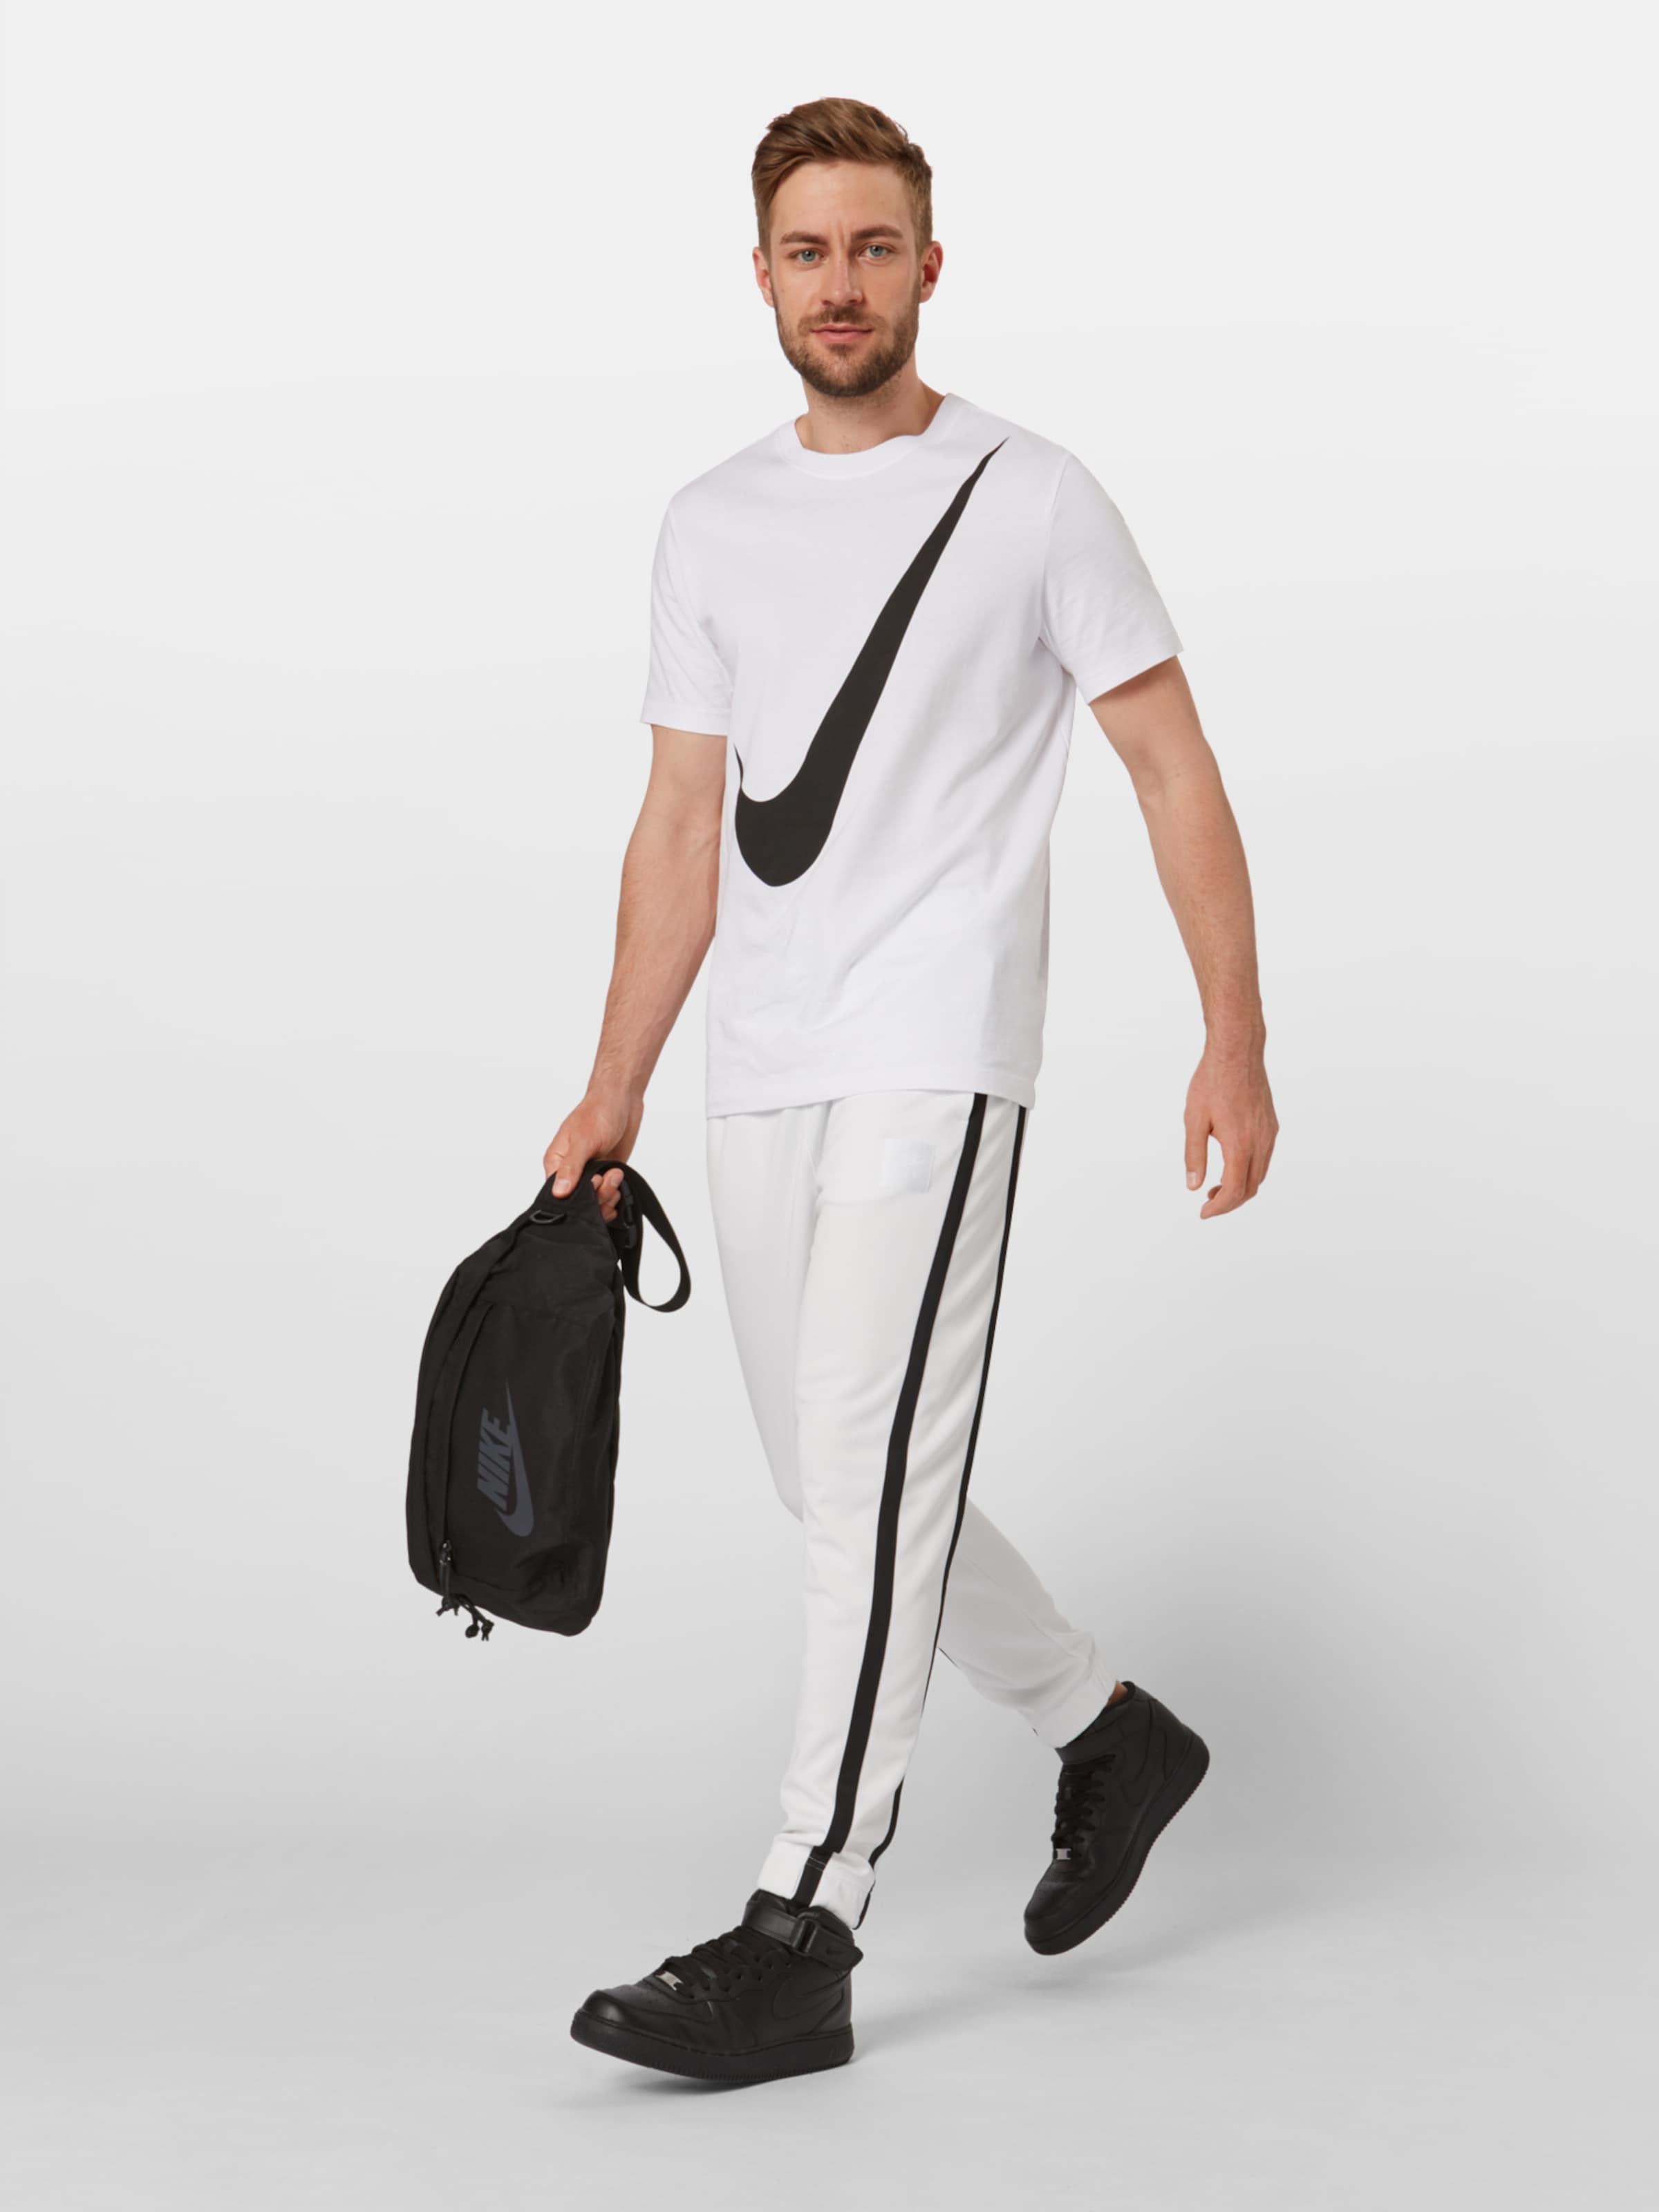 'air' NoirBlanc Sportswear En Nike Pantalon sxBChQdtr